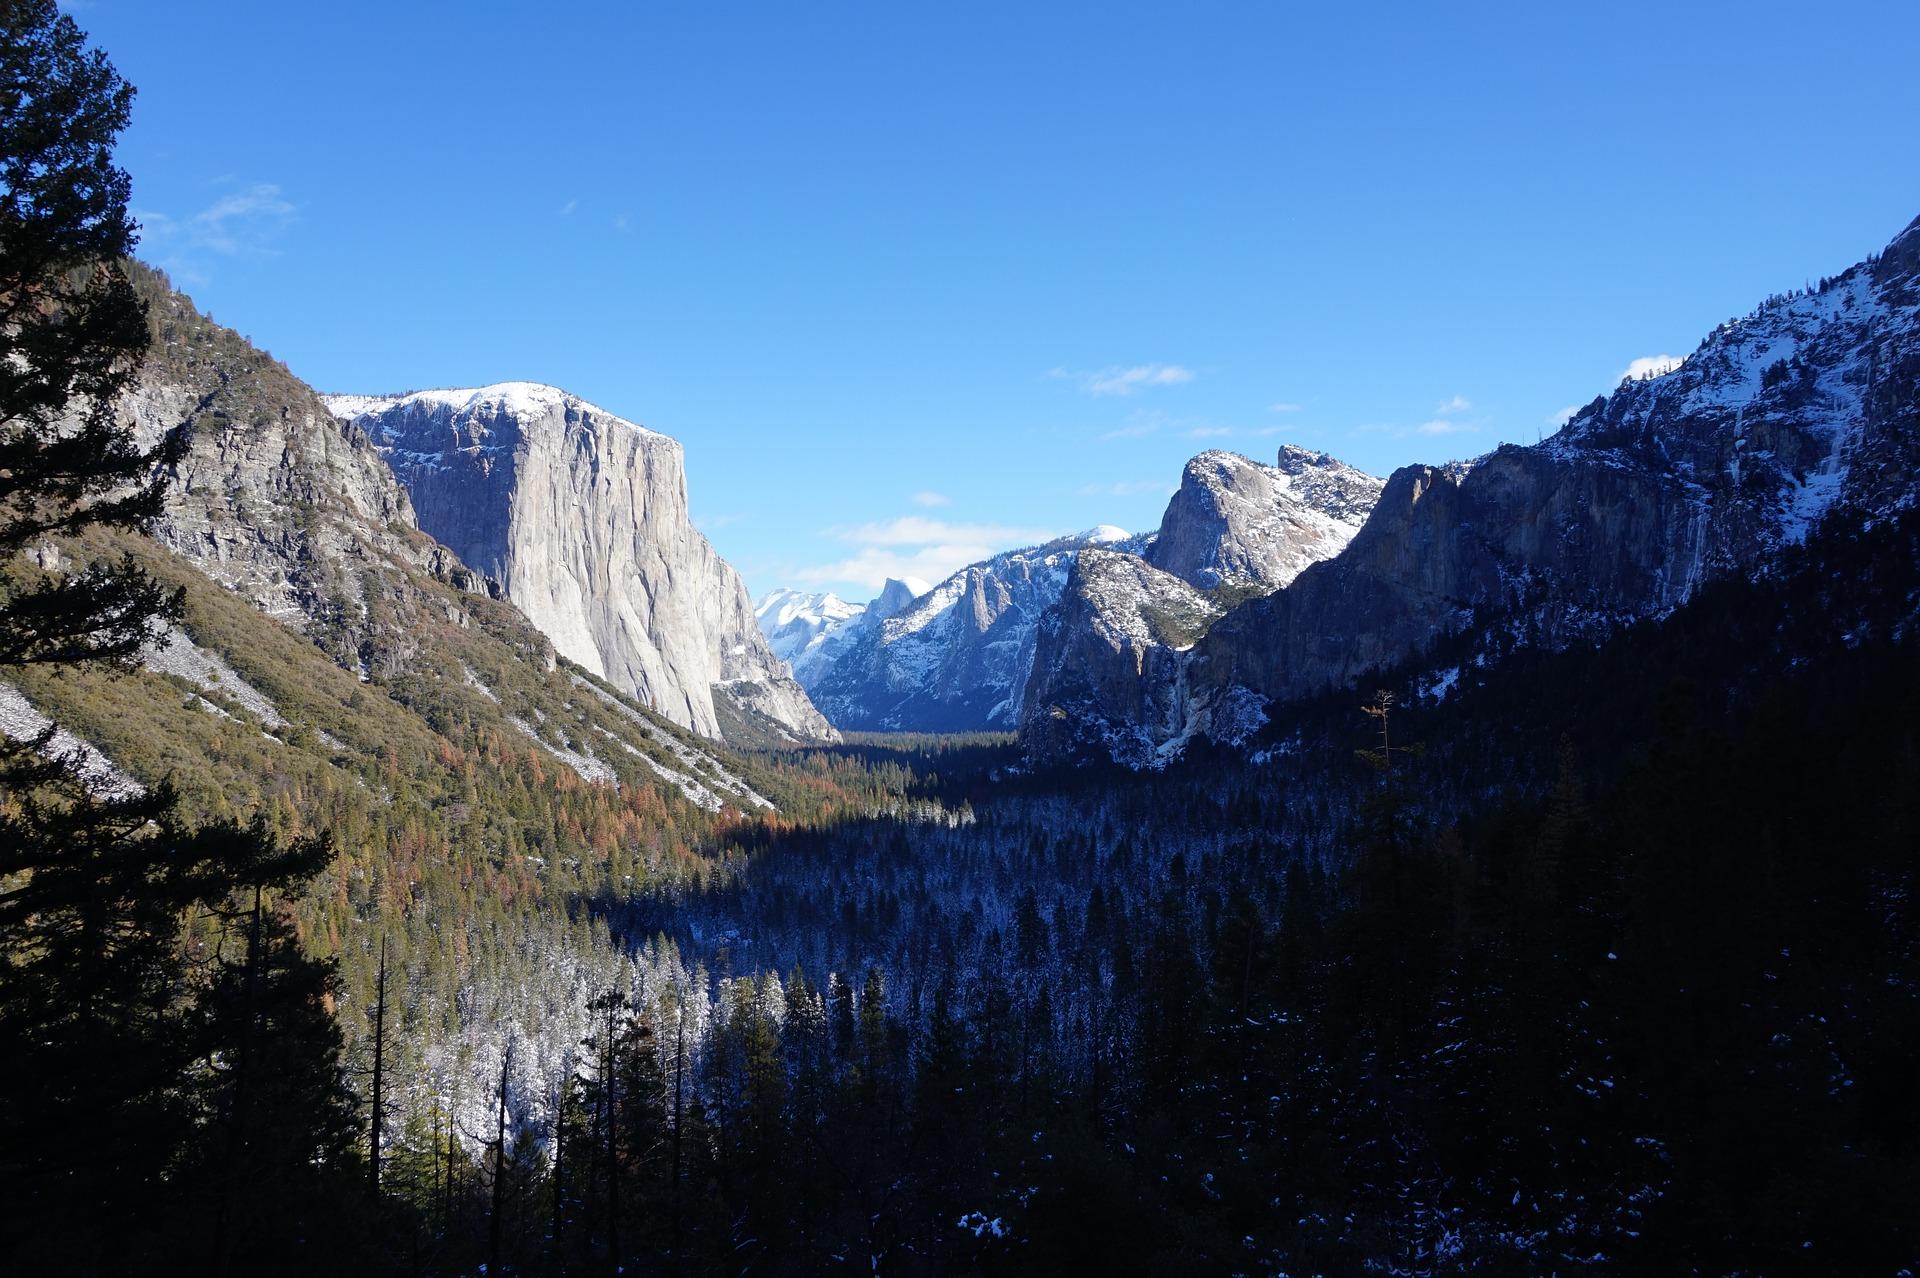 Tunnel View, Yosemite National Park in California, USA